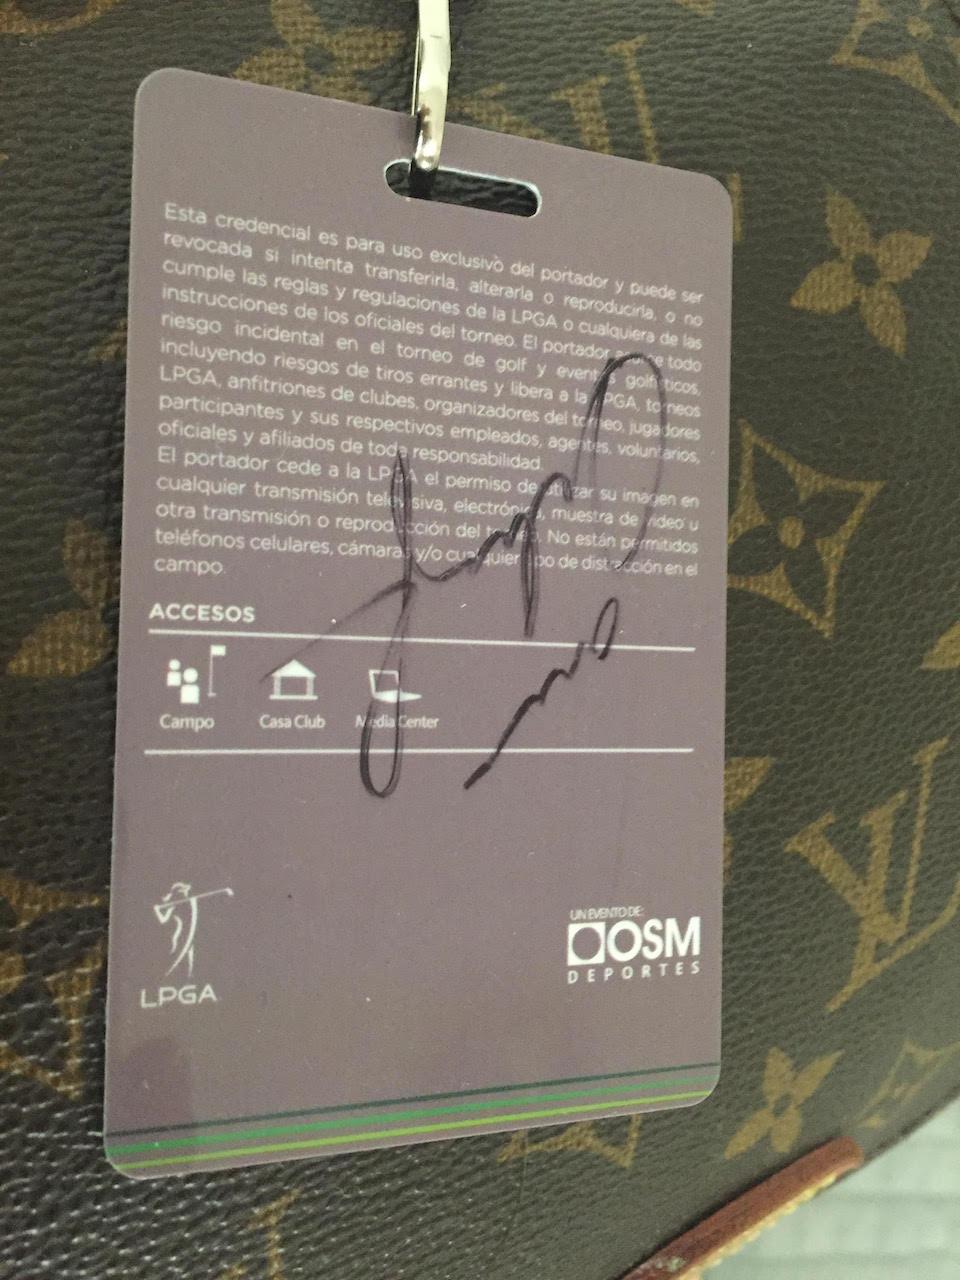 autografo de lorena